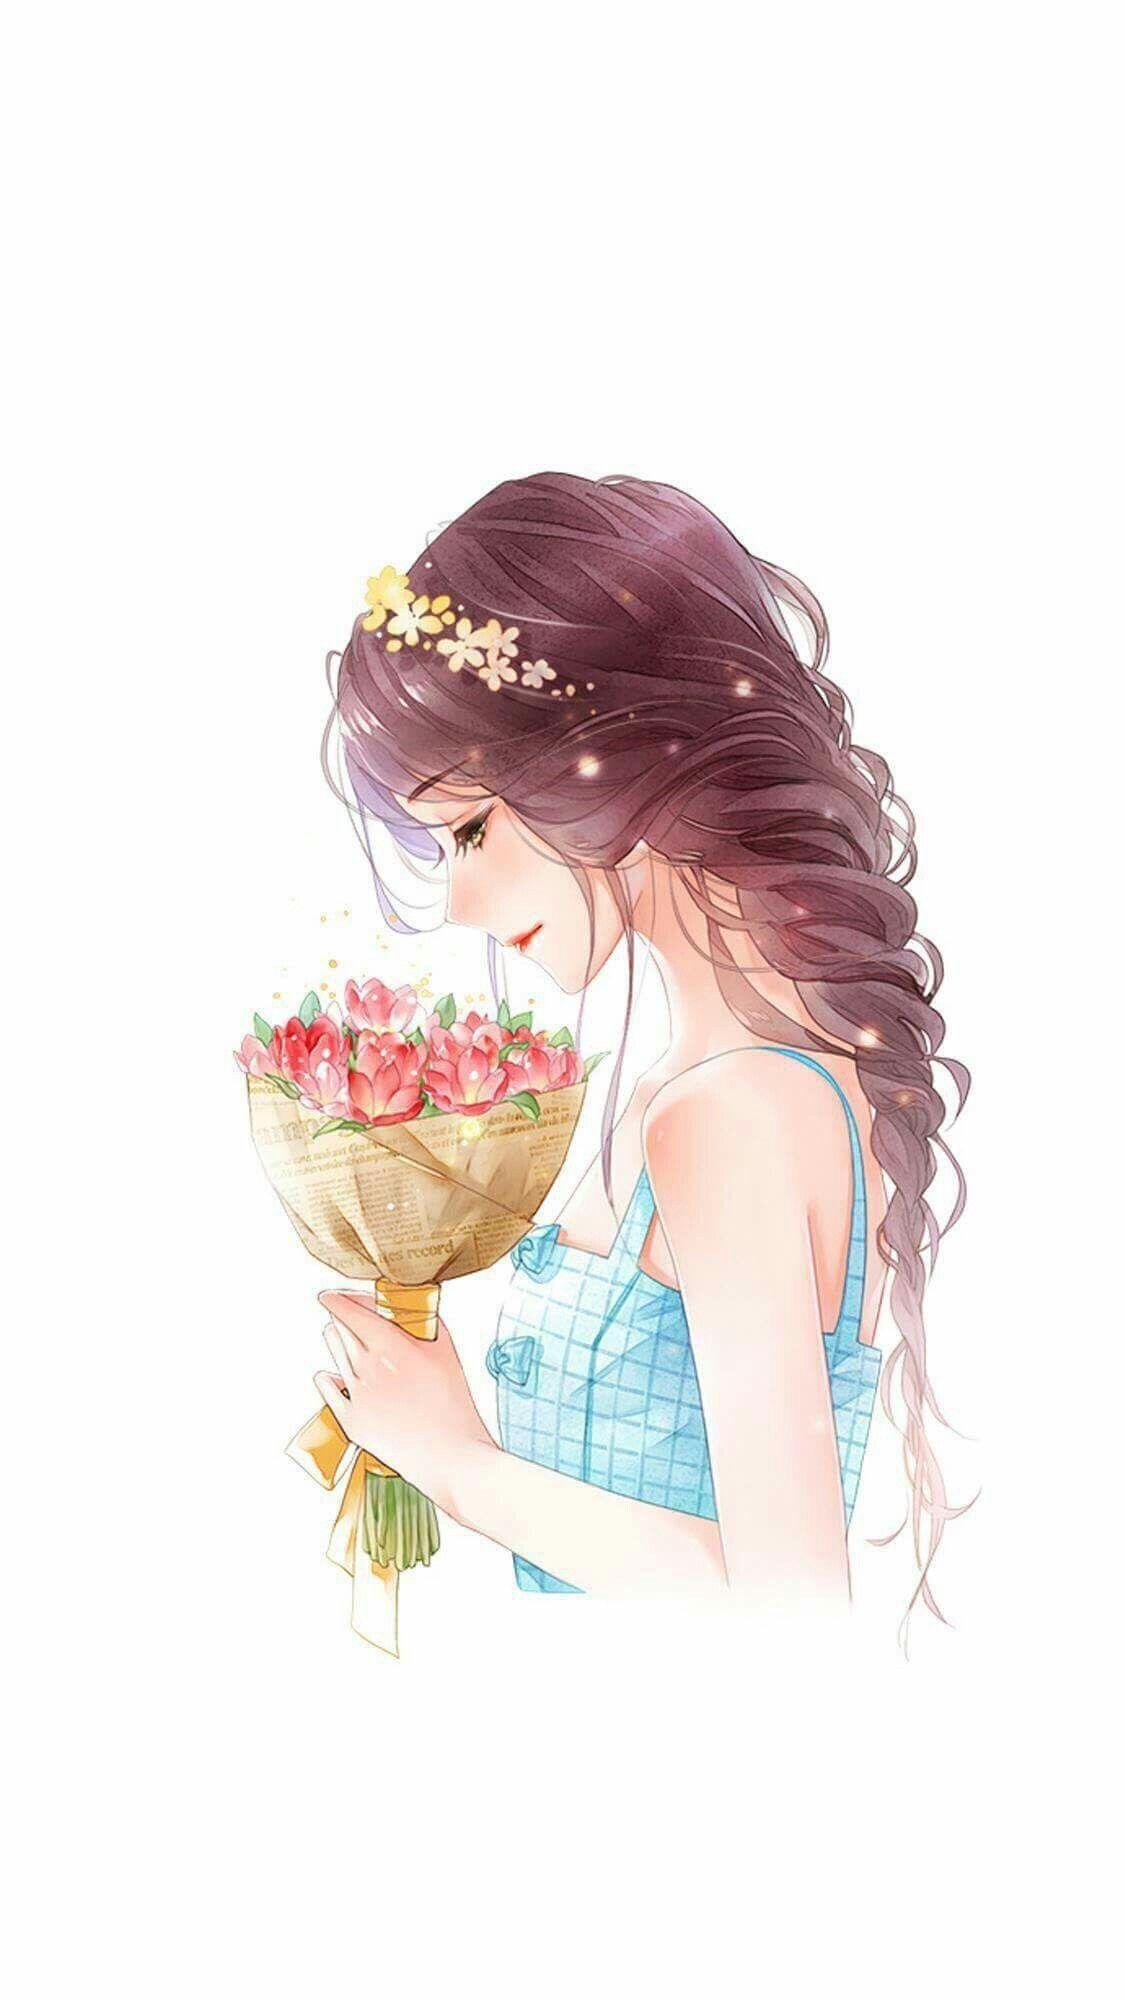 Sendiri bukan berarti lemah manga girl manga anime anime art girl cartoon